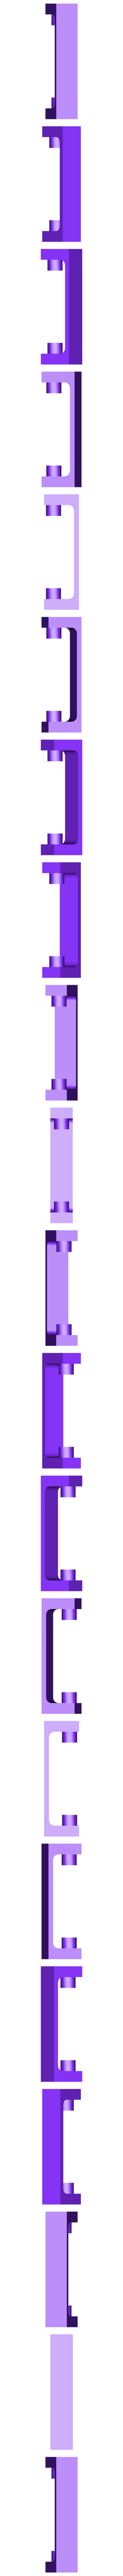 HDS 4-H.STL Download STL file NEW - Hard Drive SKYSCRAPER • 3D printer template, salva65